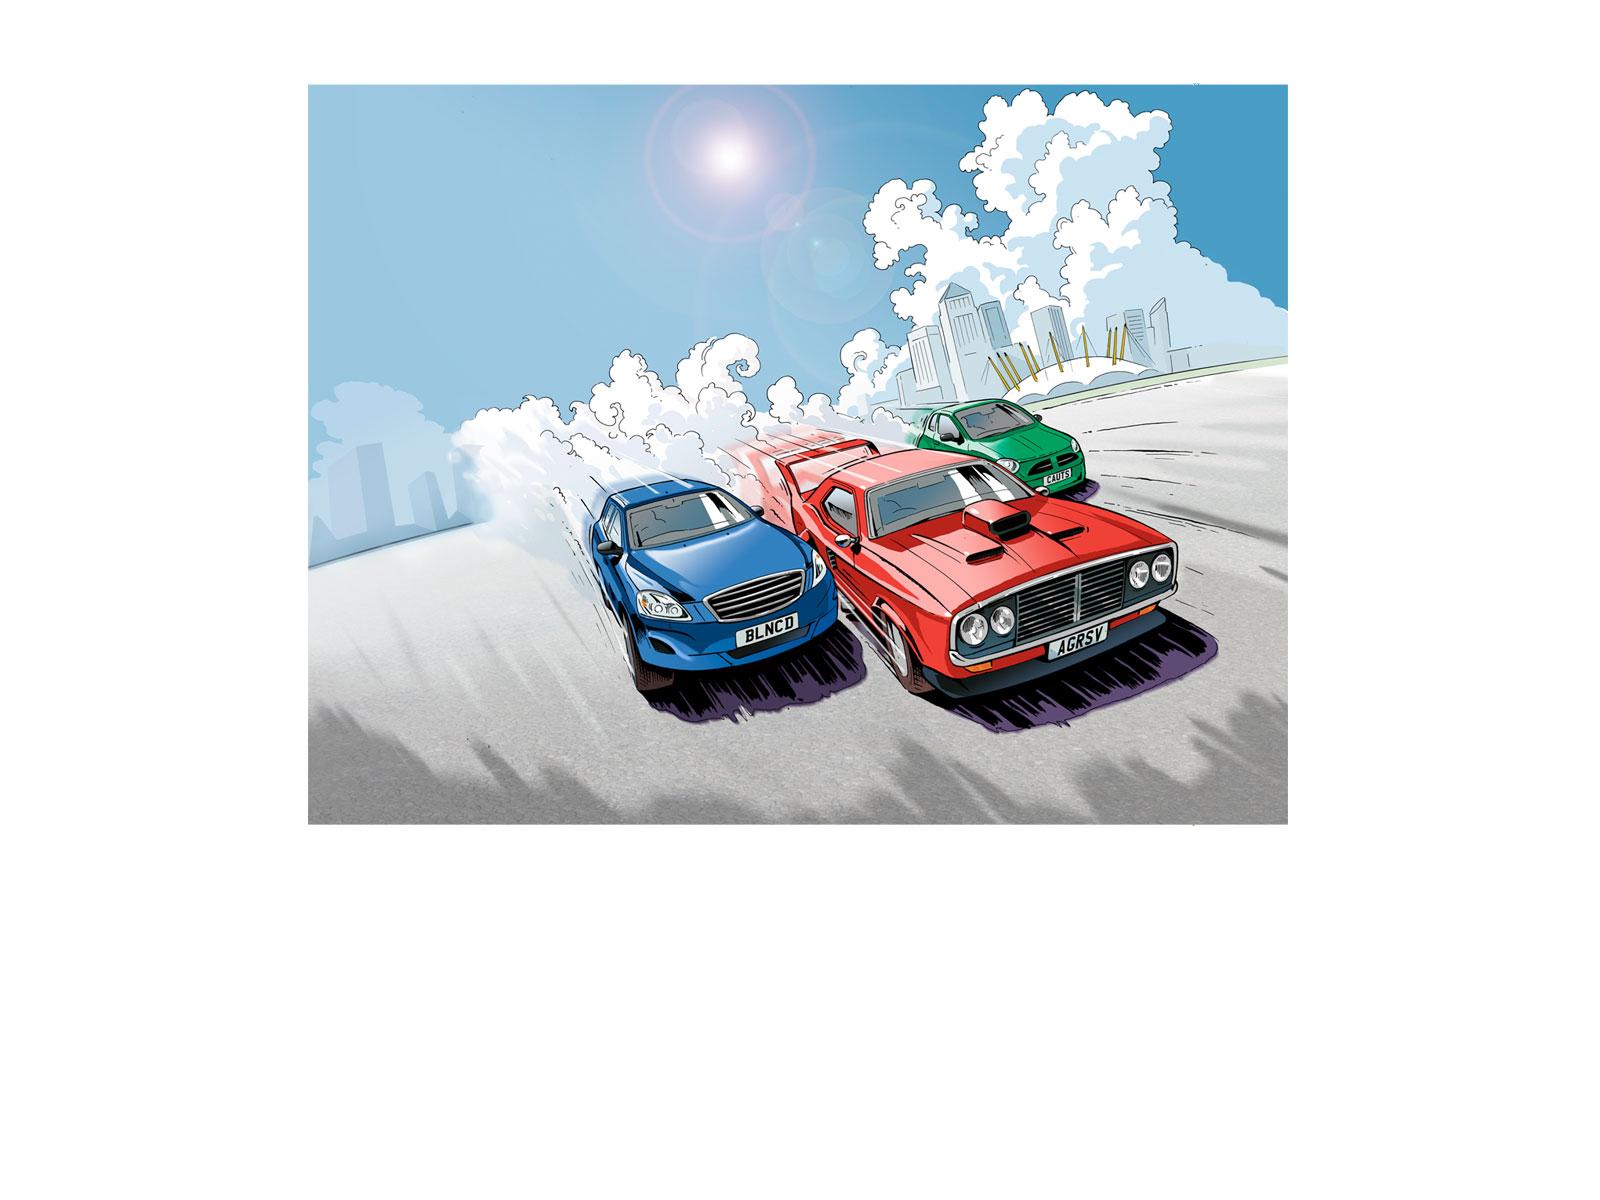 illustrations-fredvandeelen-3812